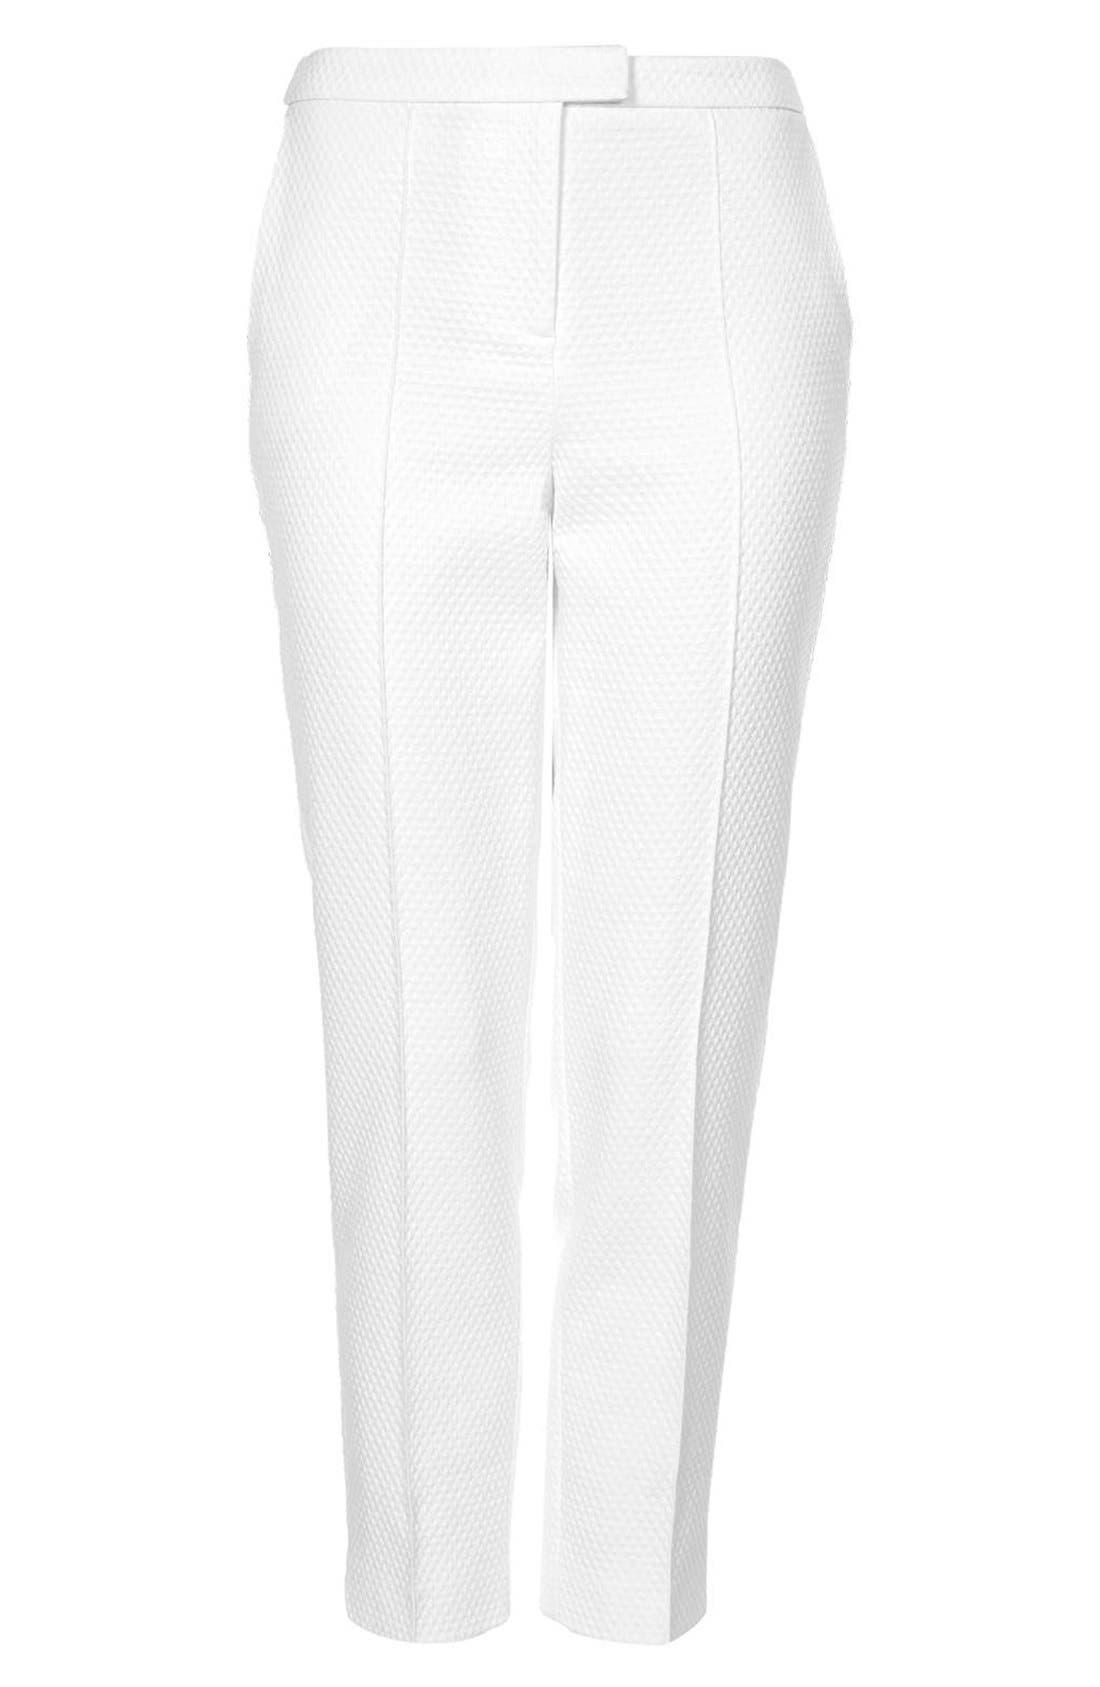 Alternate Image 3  - Topshop Textured Cigarette Pants